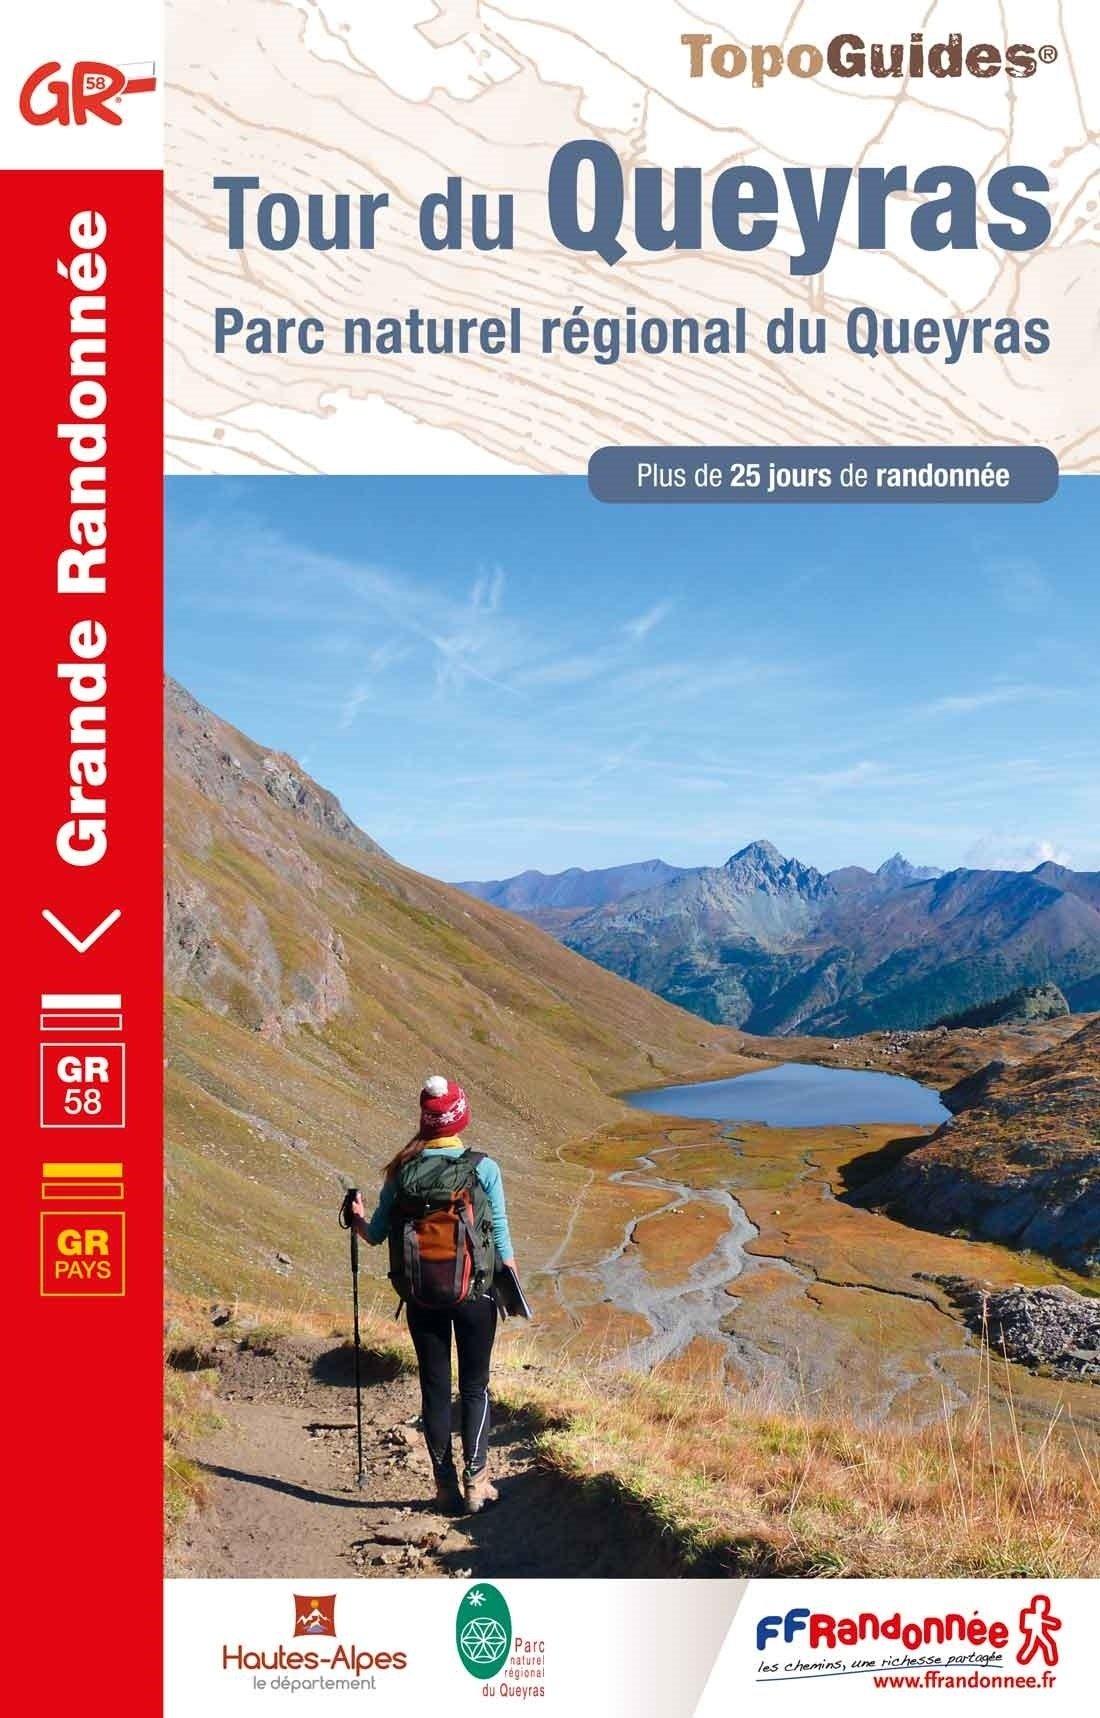 TG505  Tour du Queyras, GR-58 9782751403132  FFRP Topoguides  Meerdaagse wandelroutes, Wandelgidsen tussen Valence, Briançon, Camargue en Nice